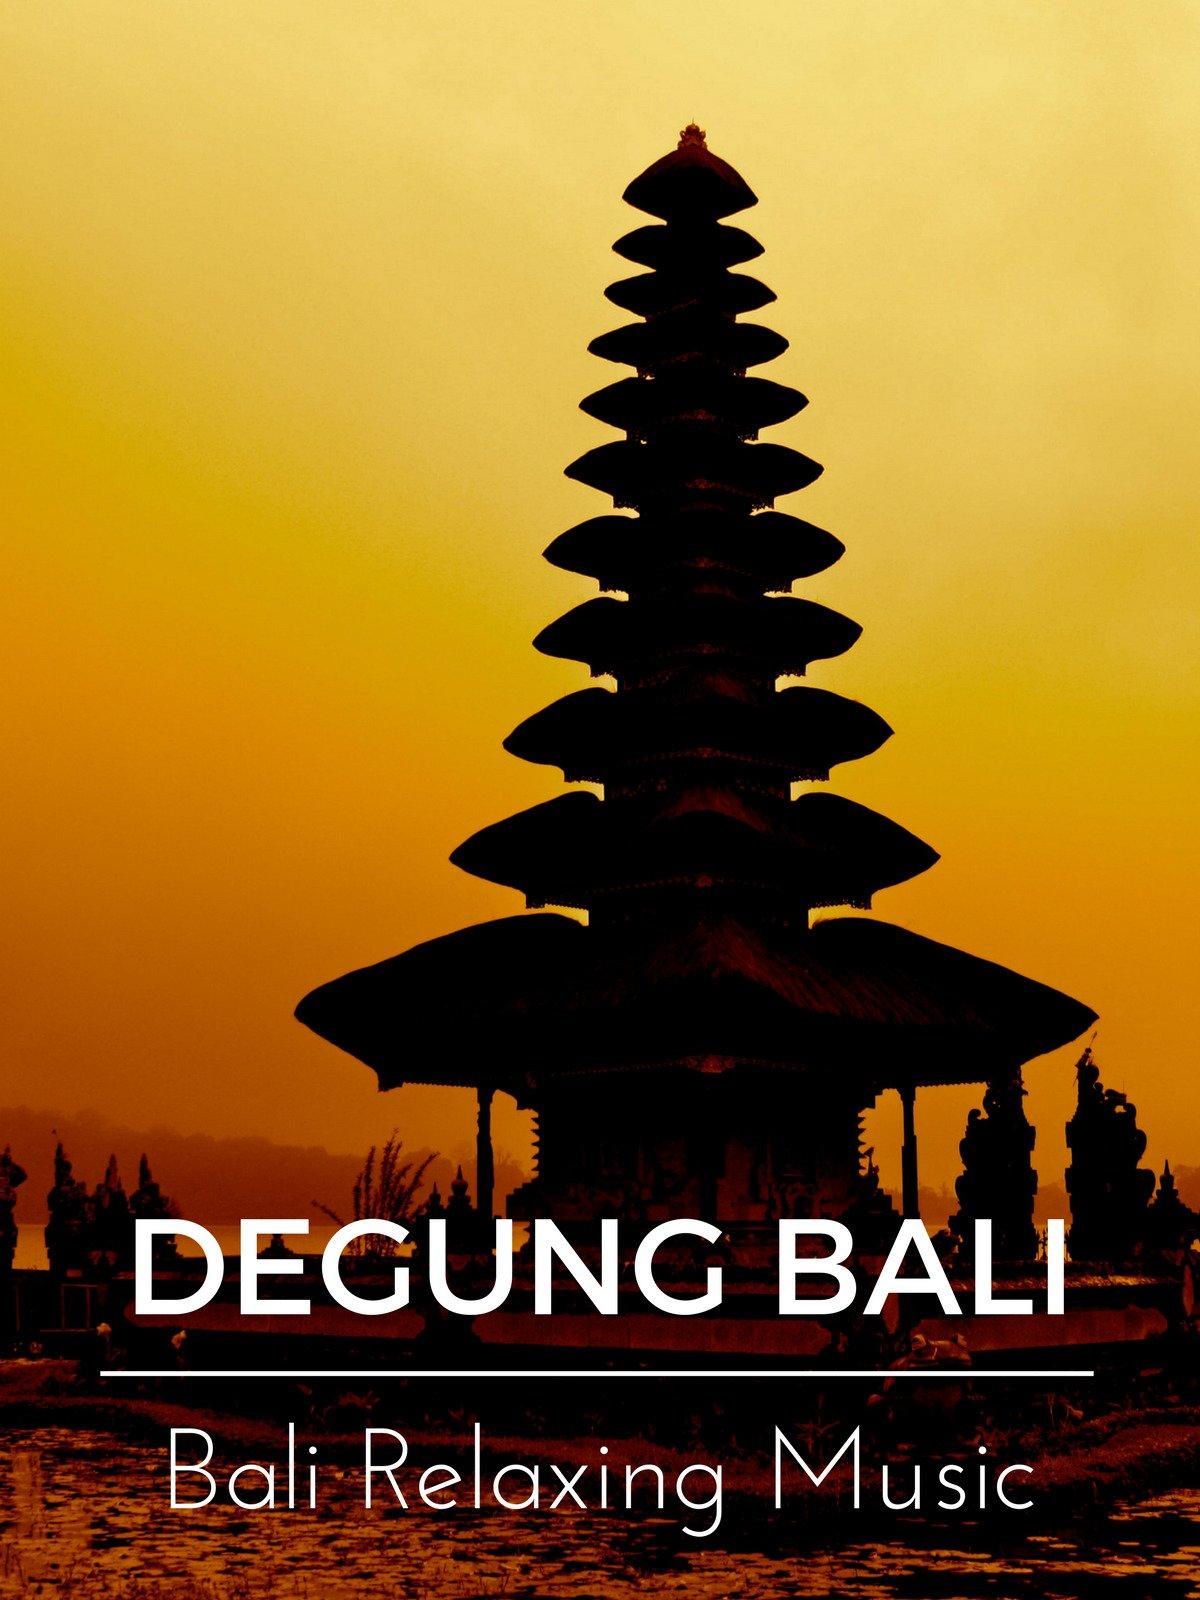 Degung Bali